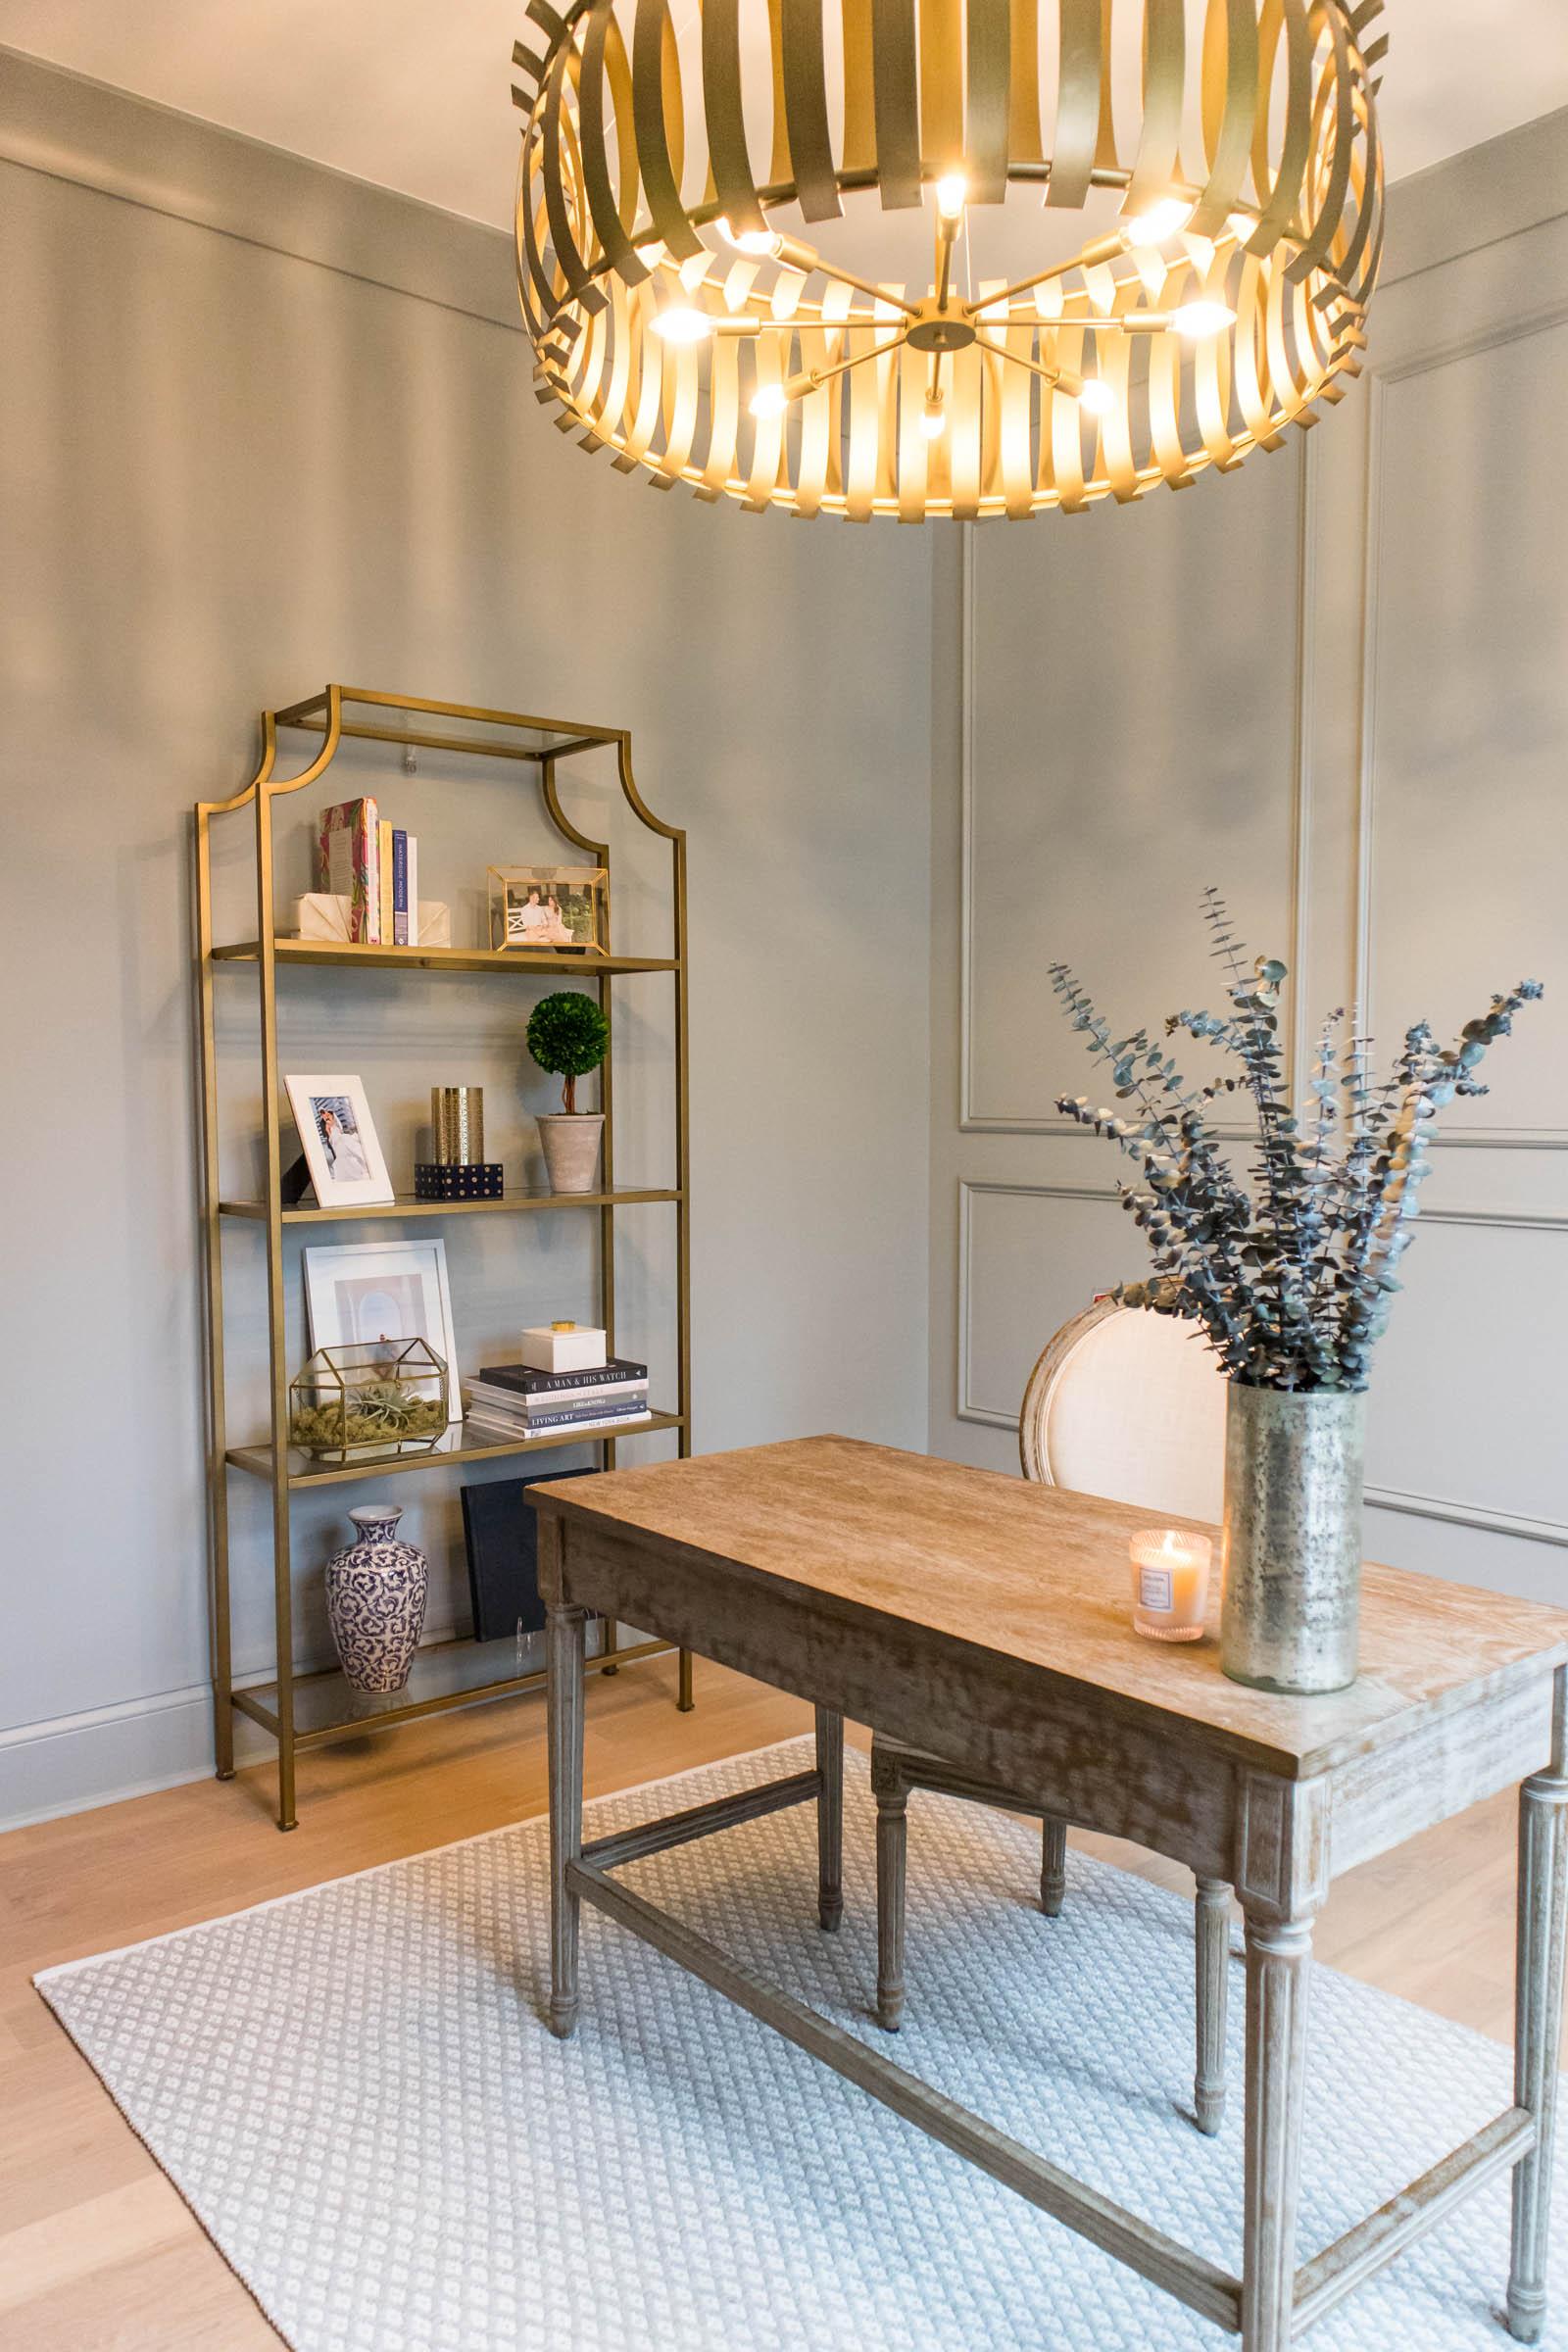 capital lighting Cayden 8 light chandelier, home office, home study